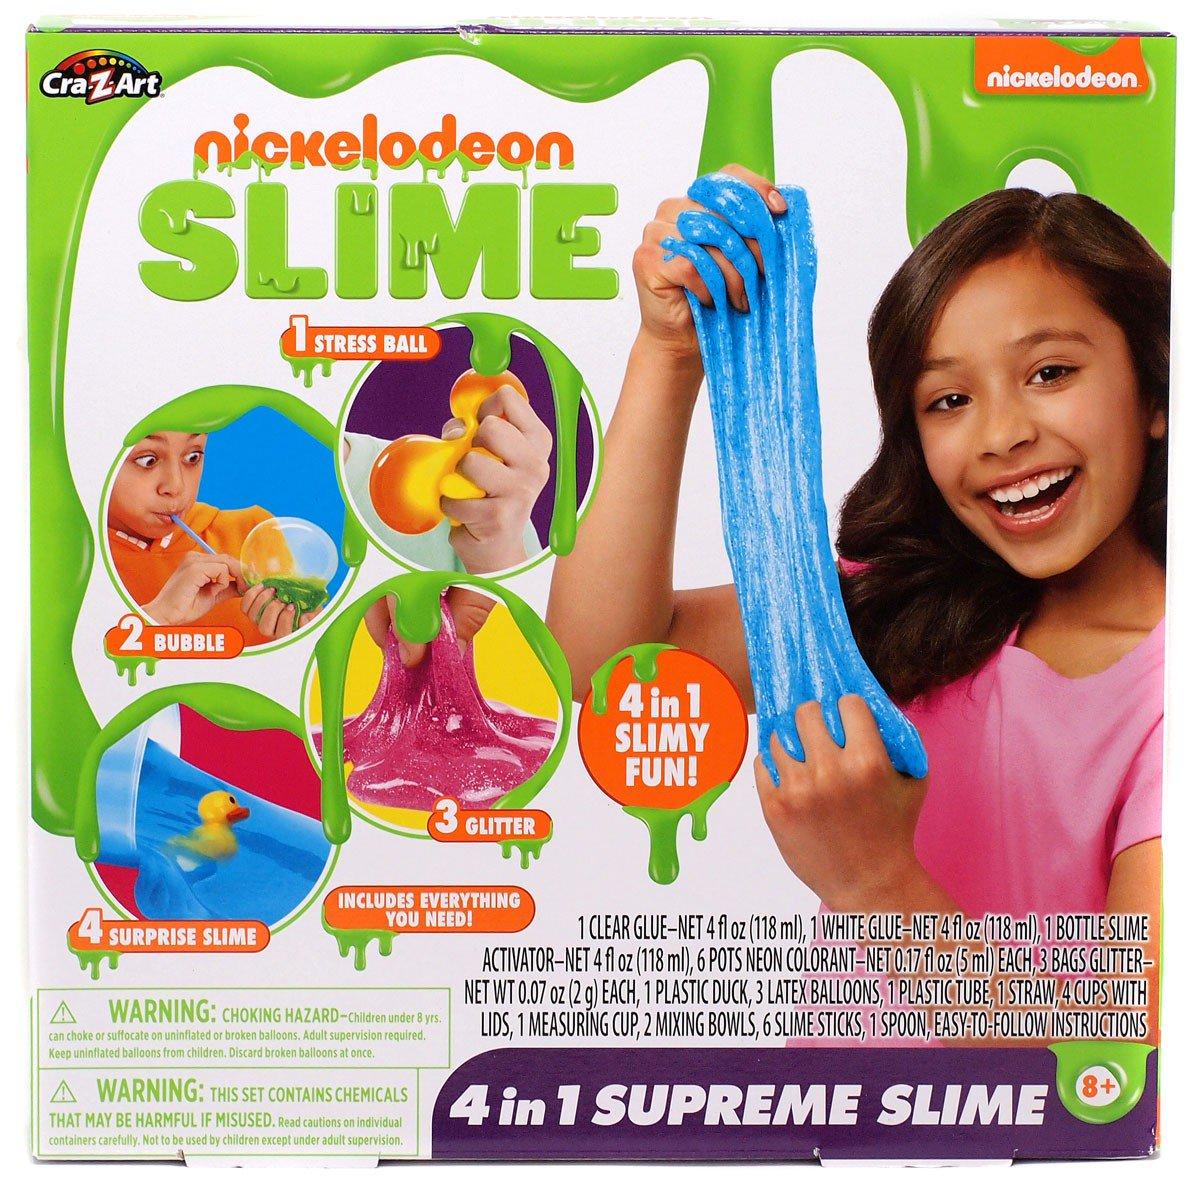 Nickelodeon 4-in-1 Supreme Slime Kit by Cra-Z-Art